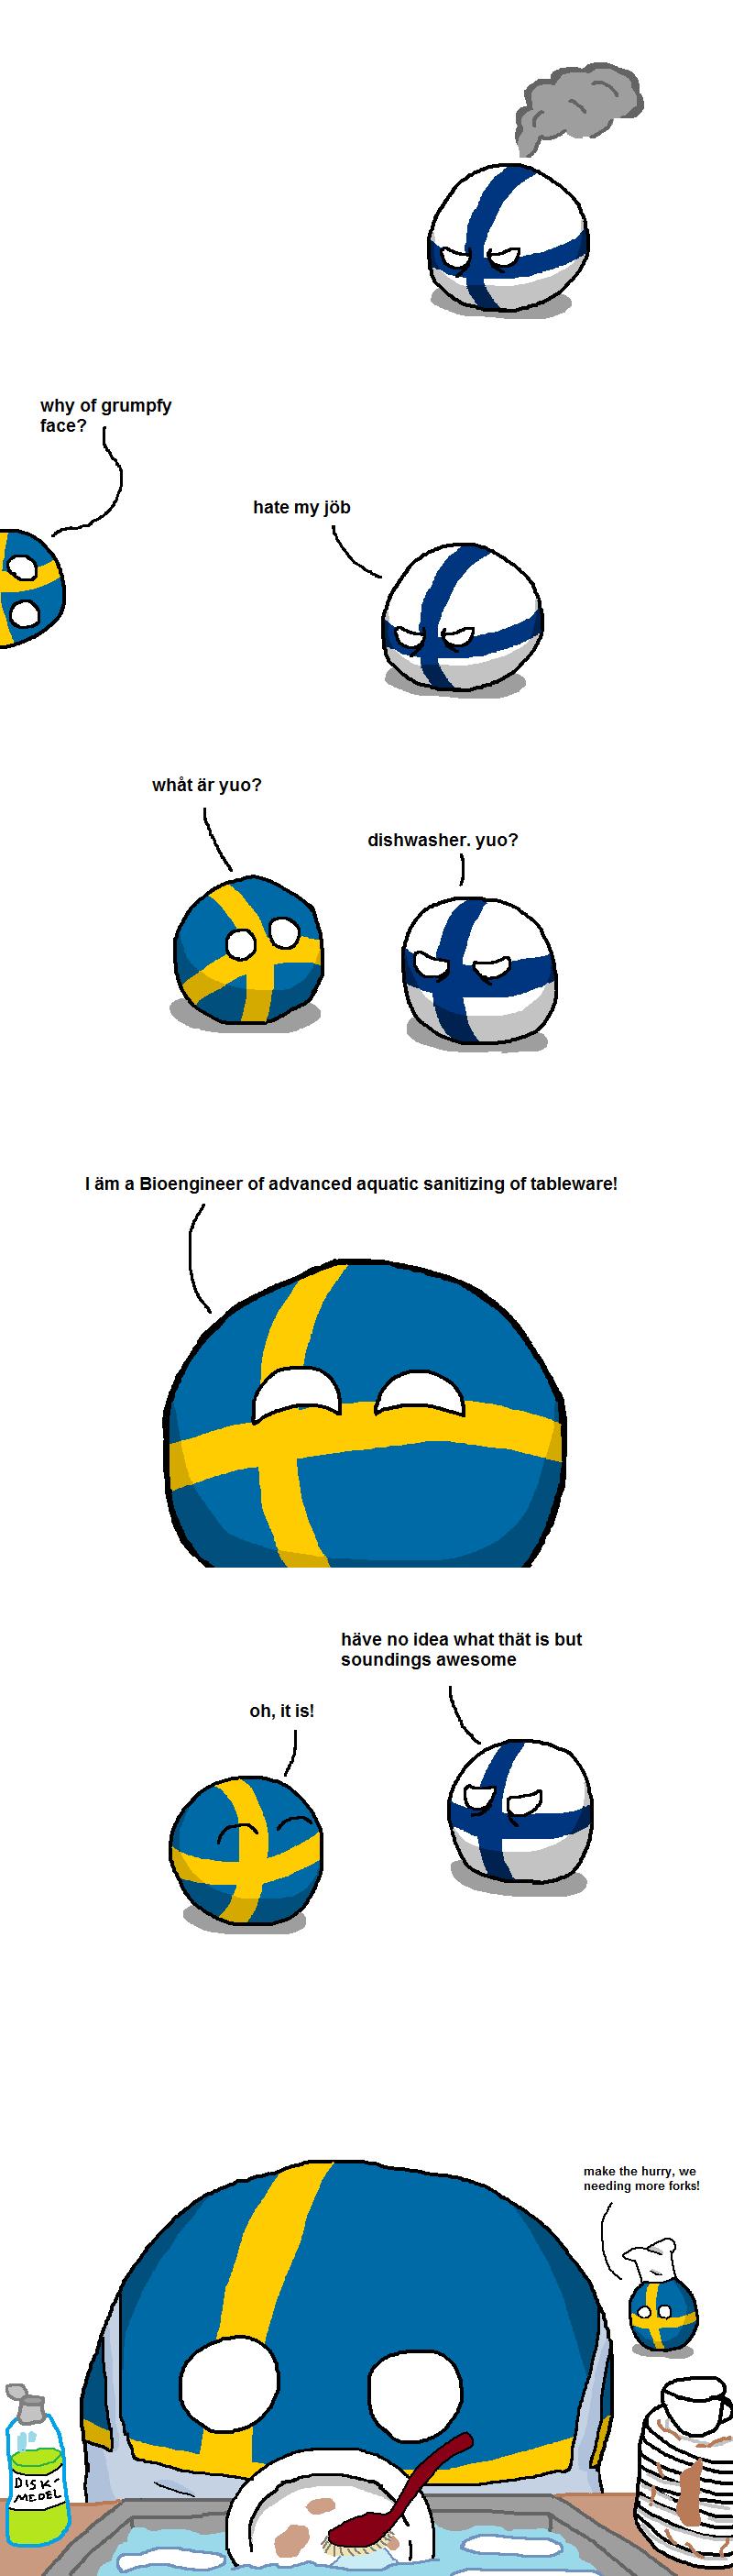 Sweden doing what Sweden does